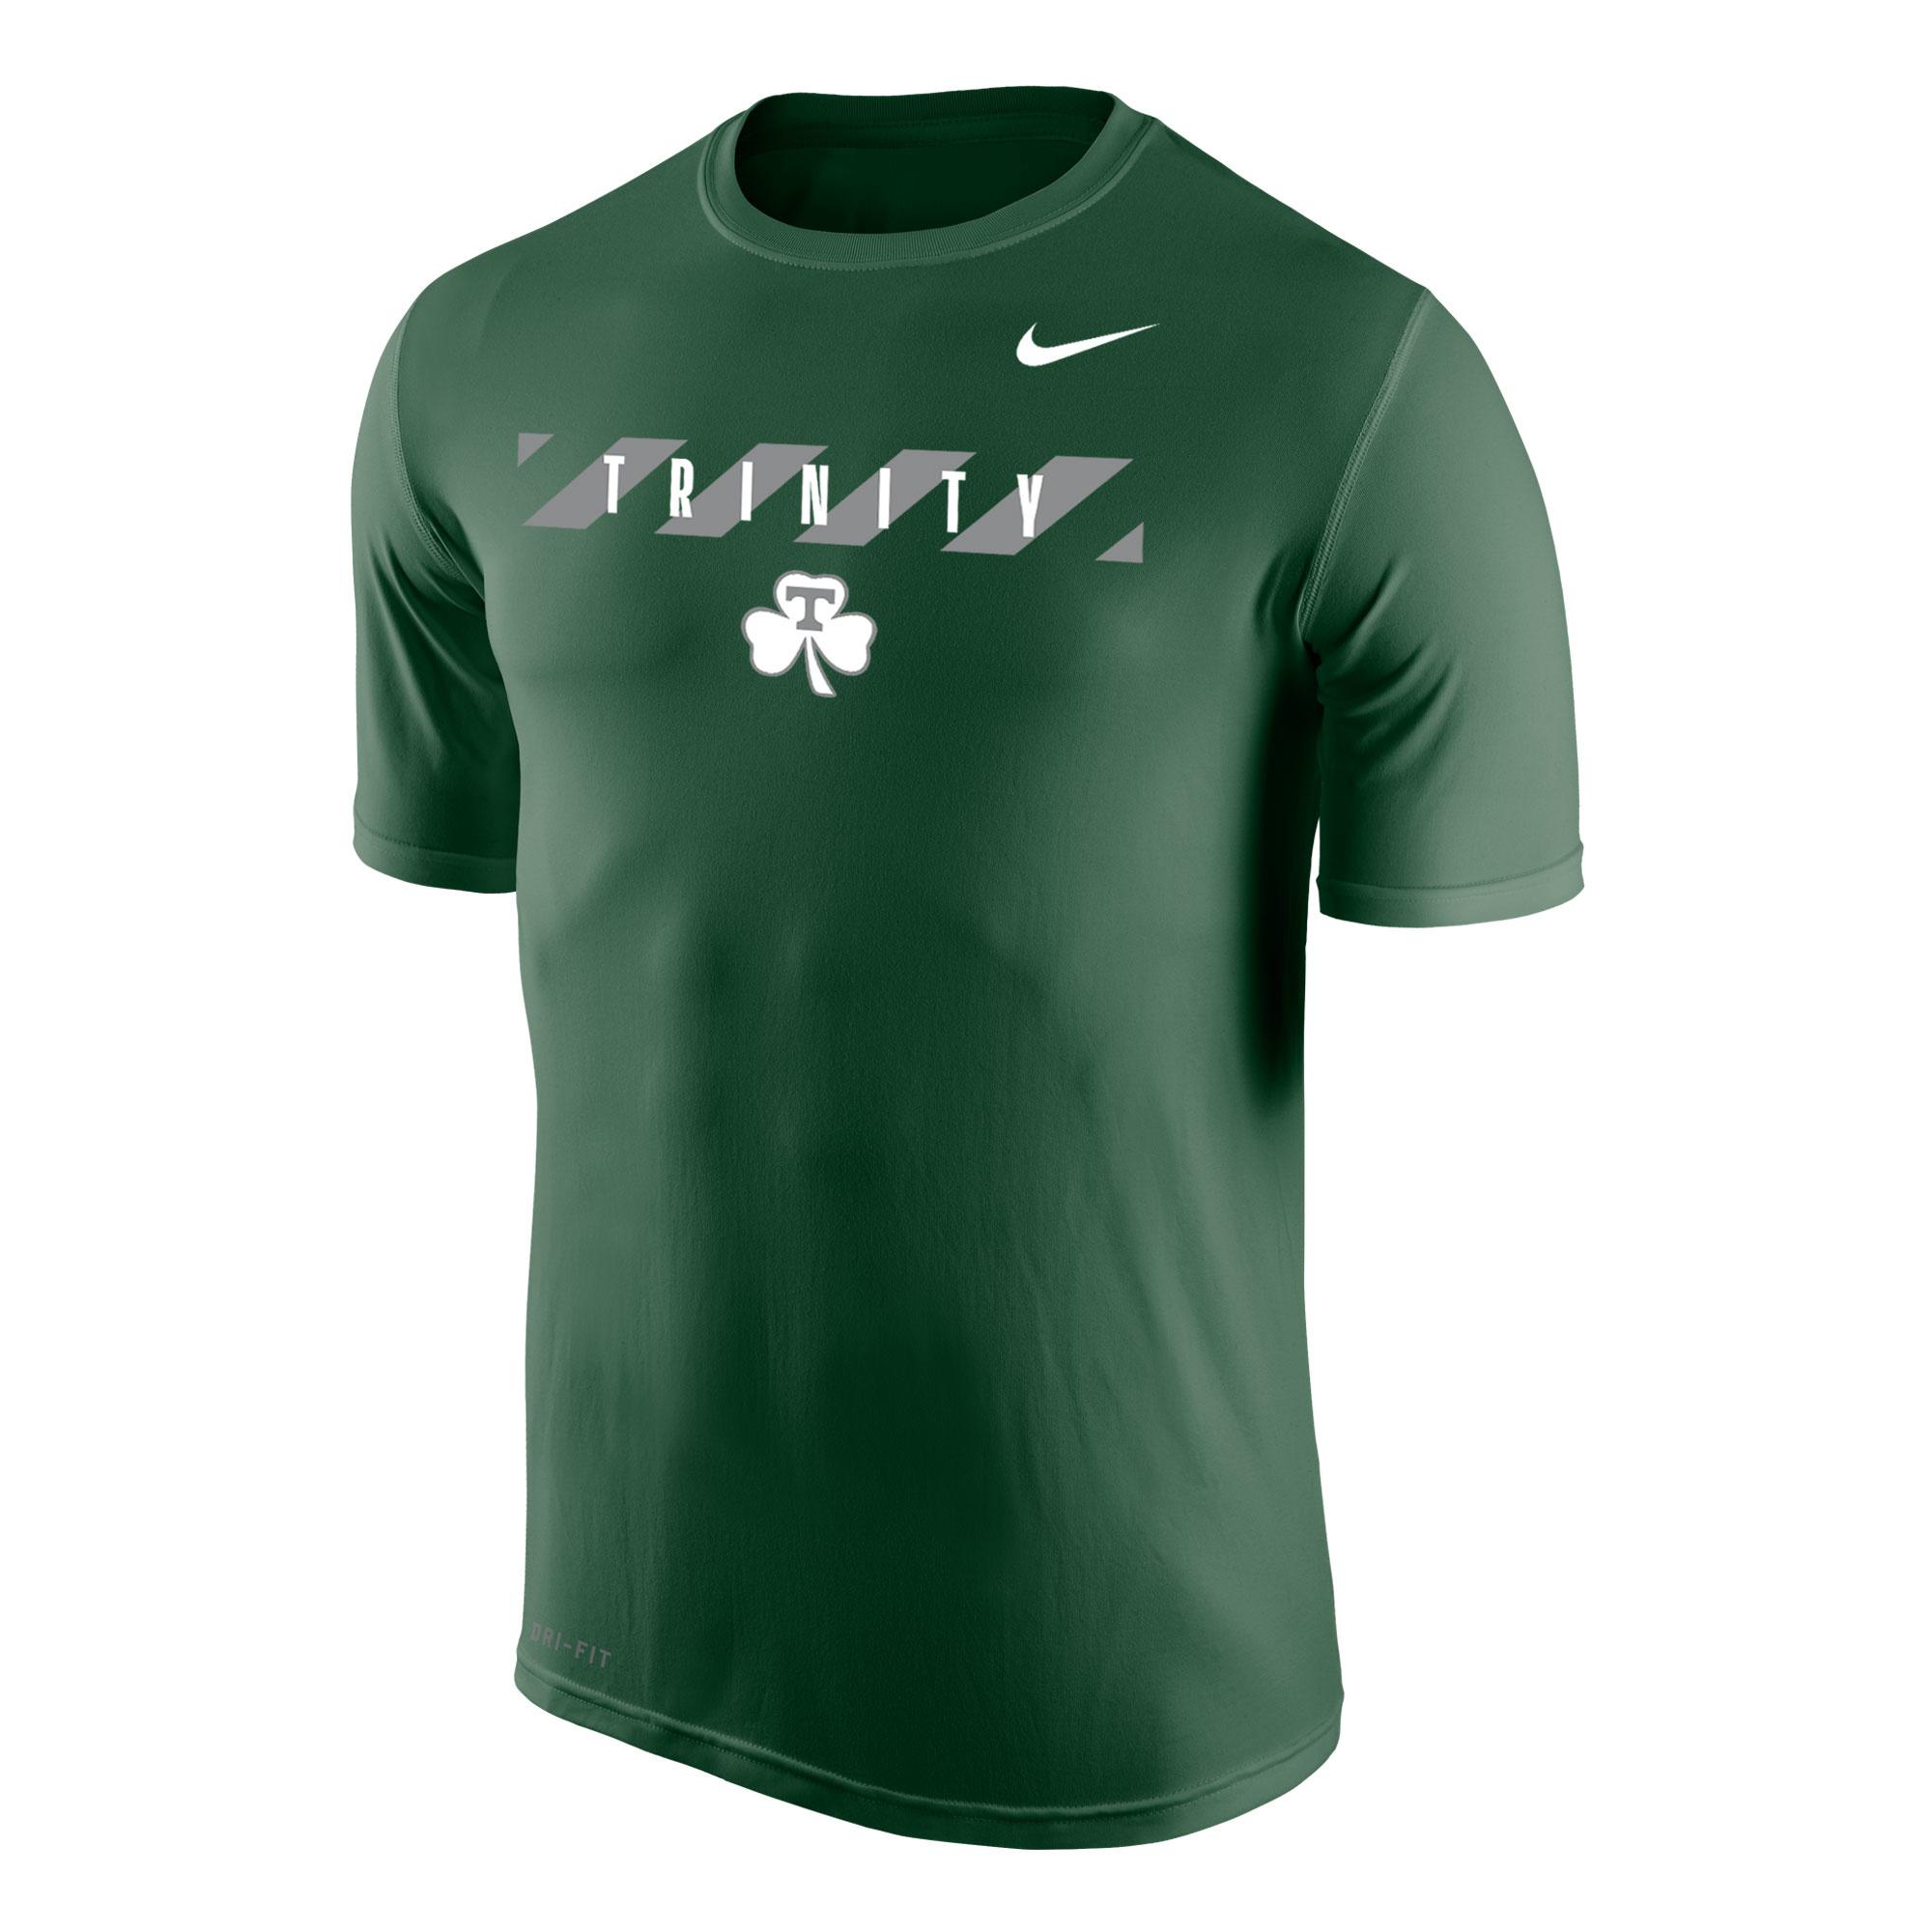 Nike Nike Dri Fit Green